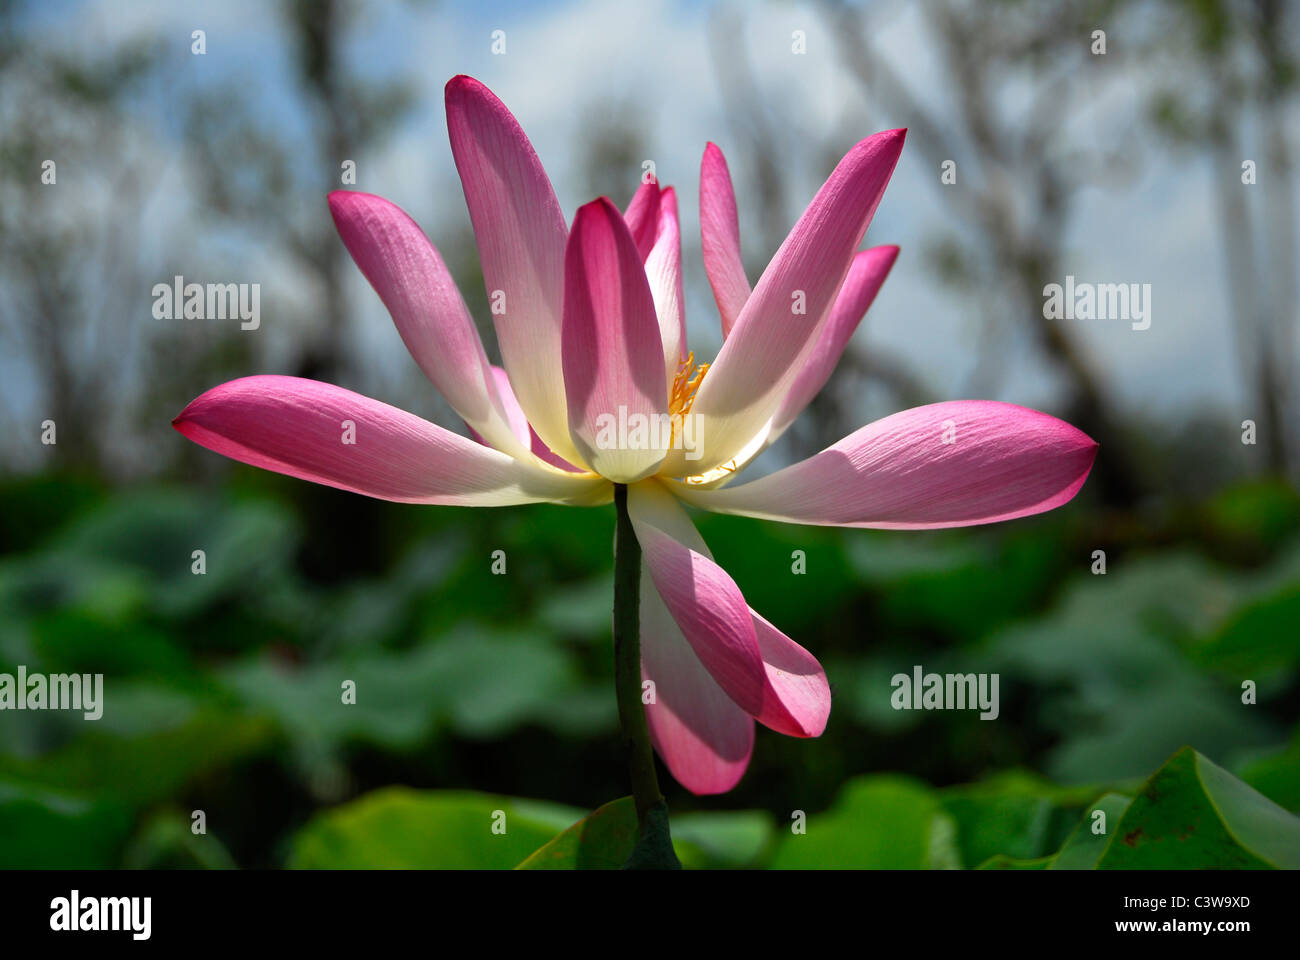 Pink Lotus In Swamp Nature Stock Photos Pink Lotus In Swamp Nature